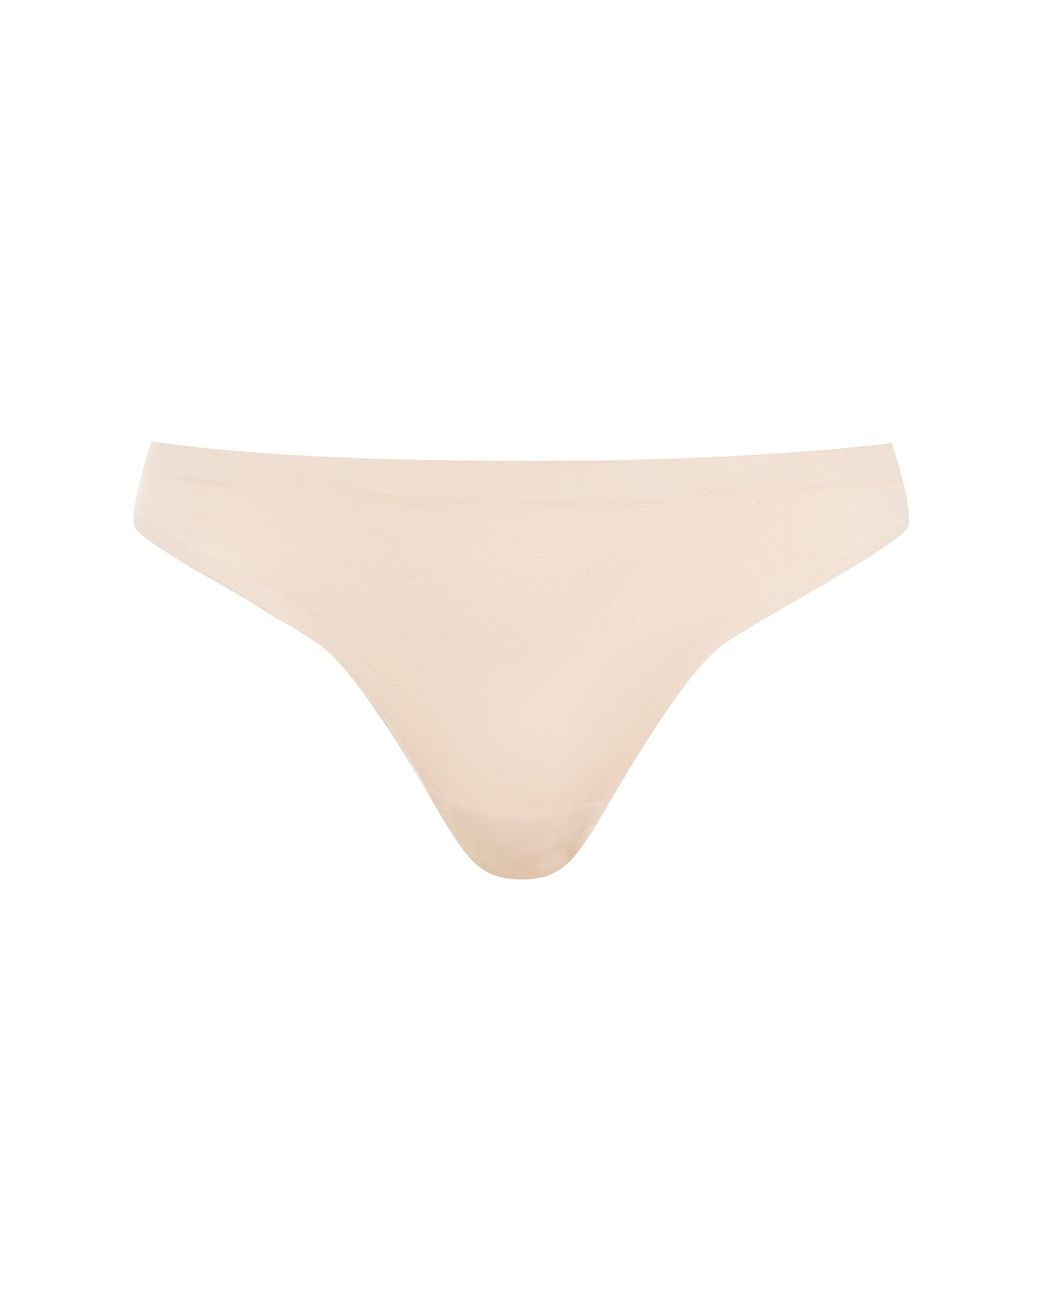 Topshop 3 Pack Bikini Briefs /& Thong Knickers